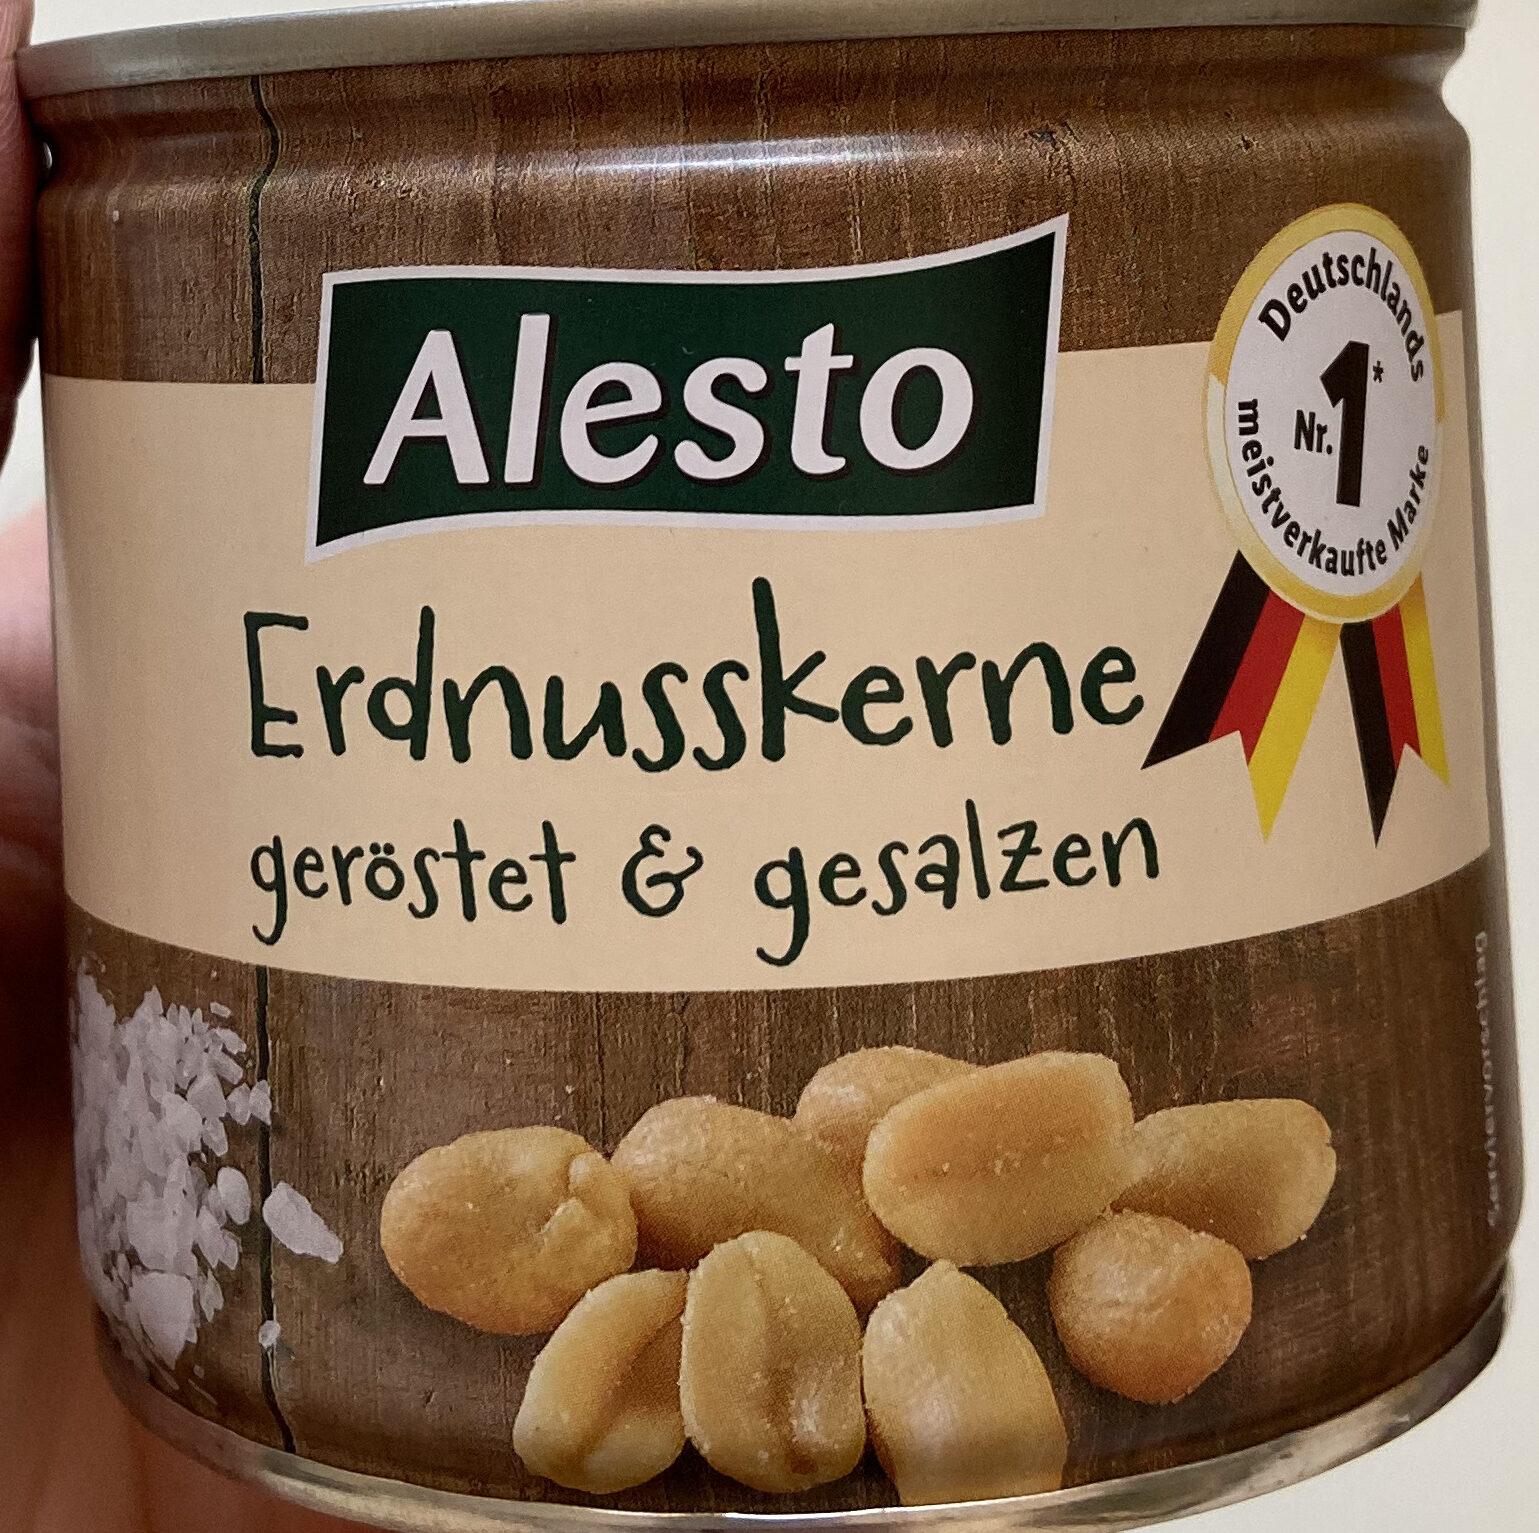 Erdnusskerne, geröstet & gesalzen - Prodotto - de